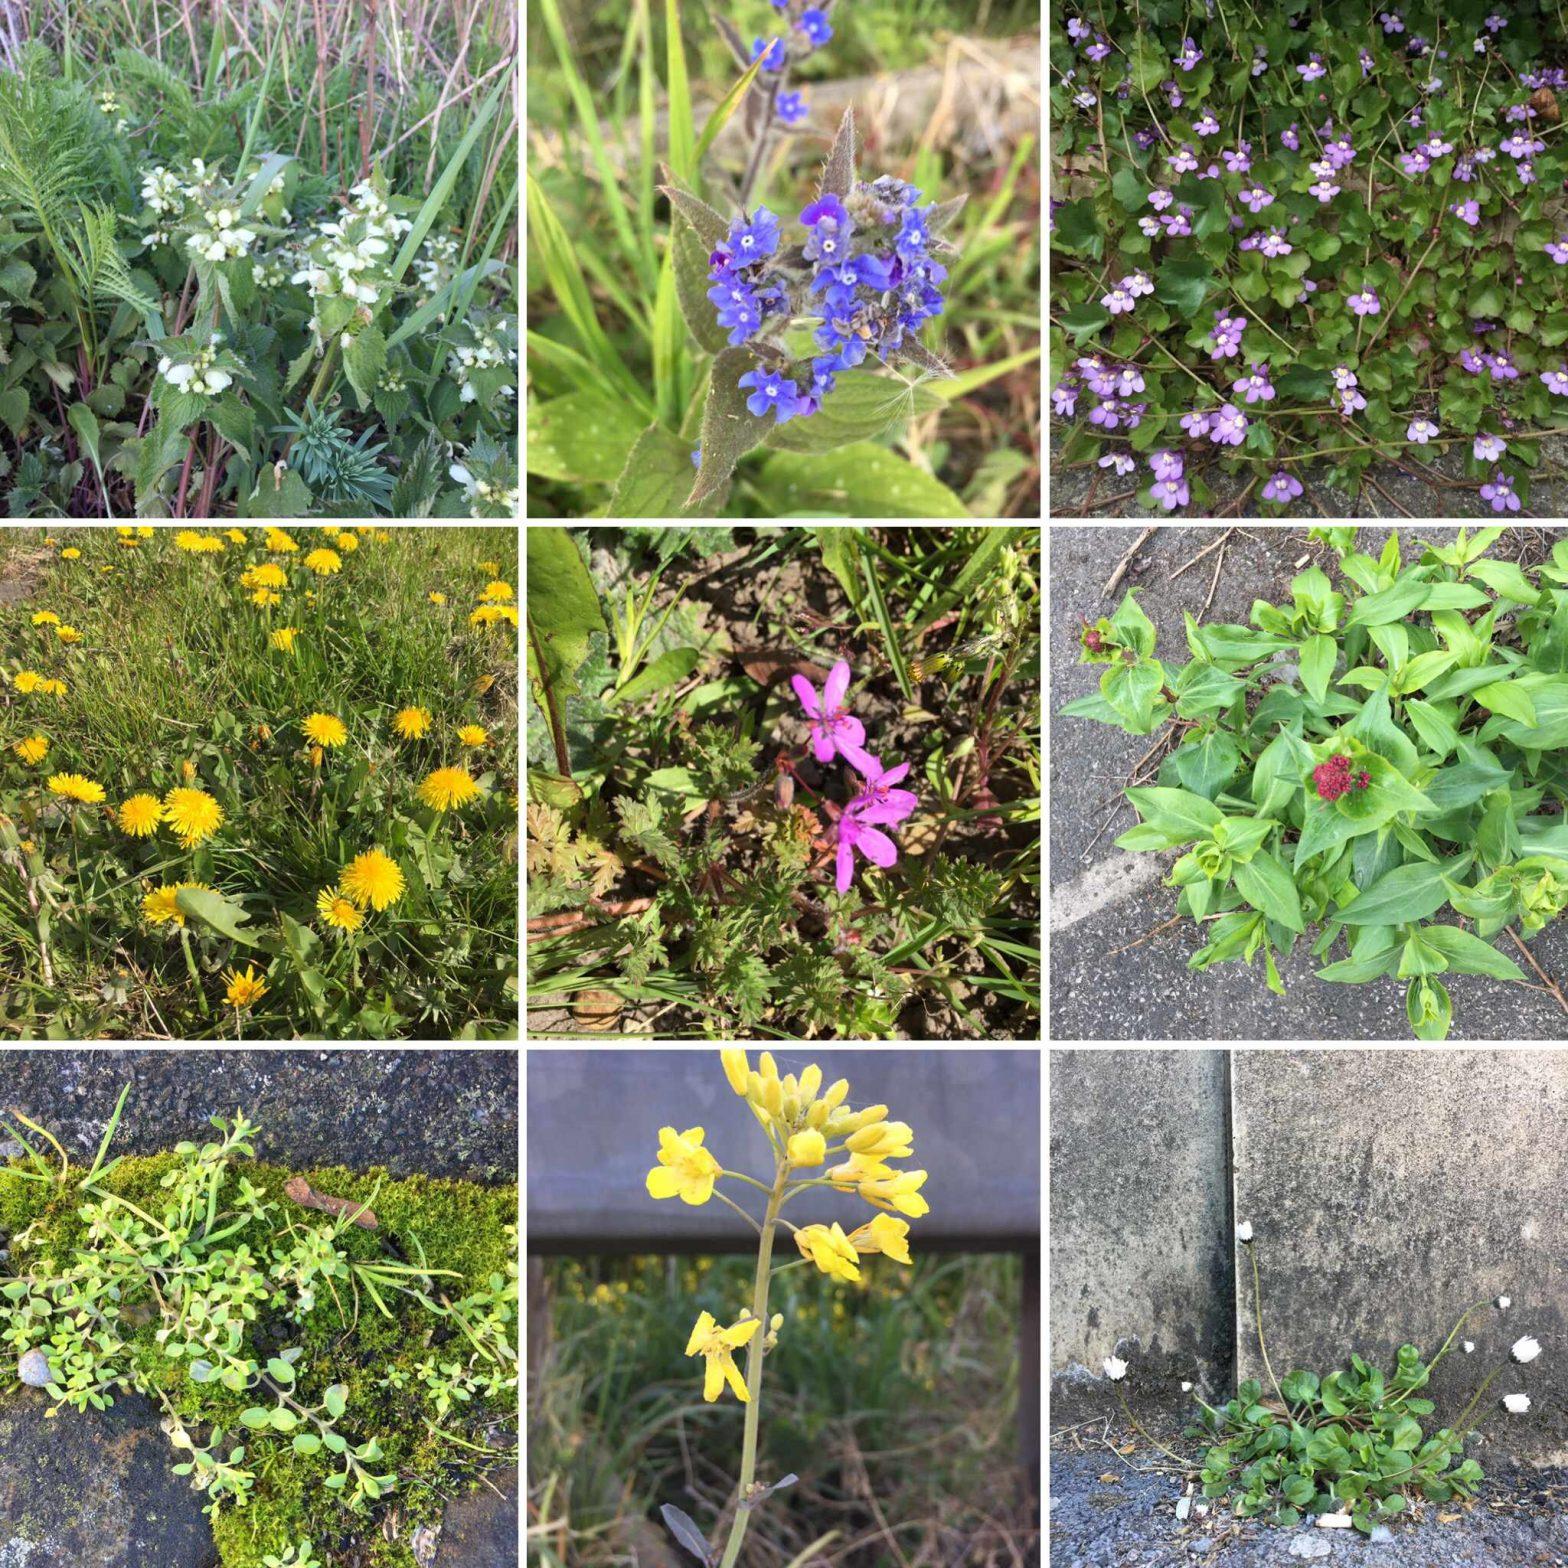 A grid of nine photos of urban wildflowers